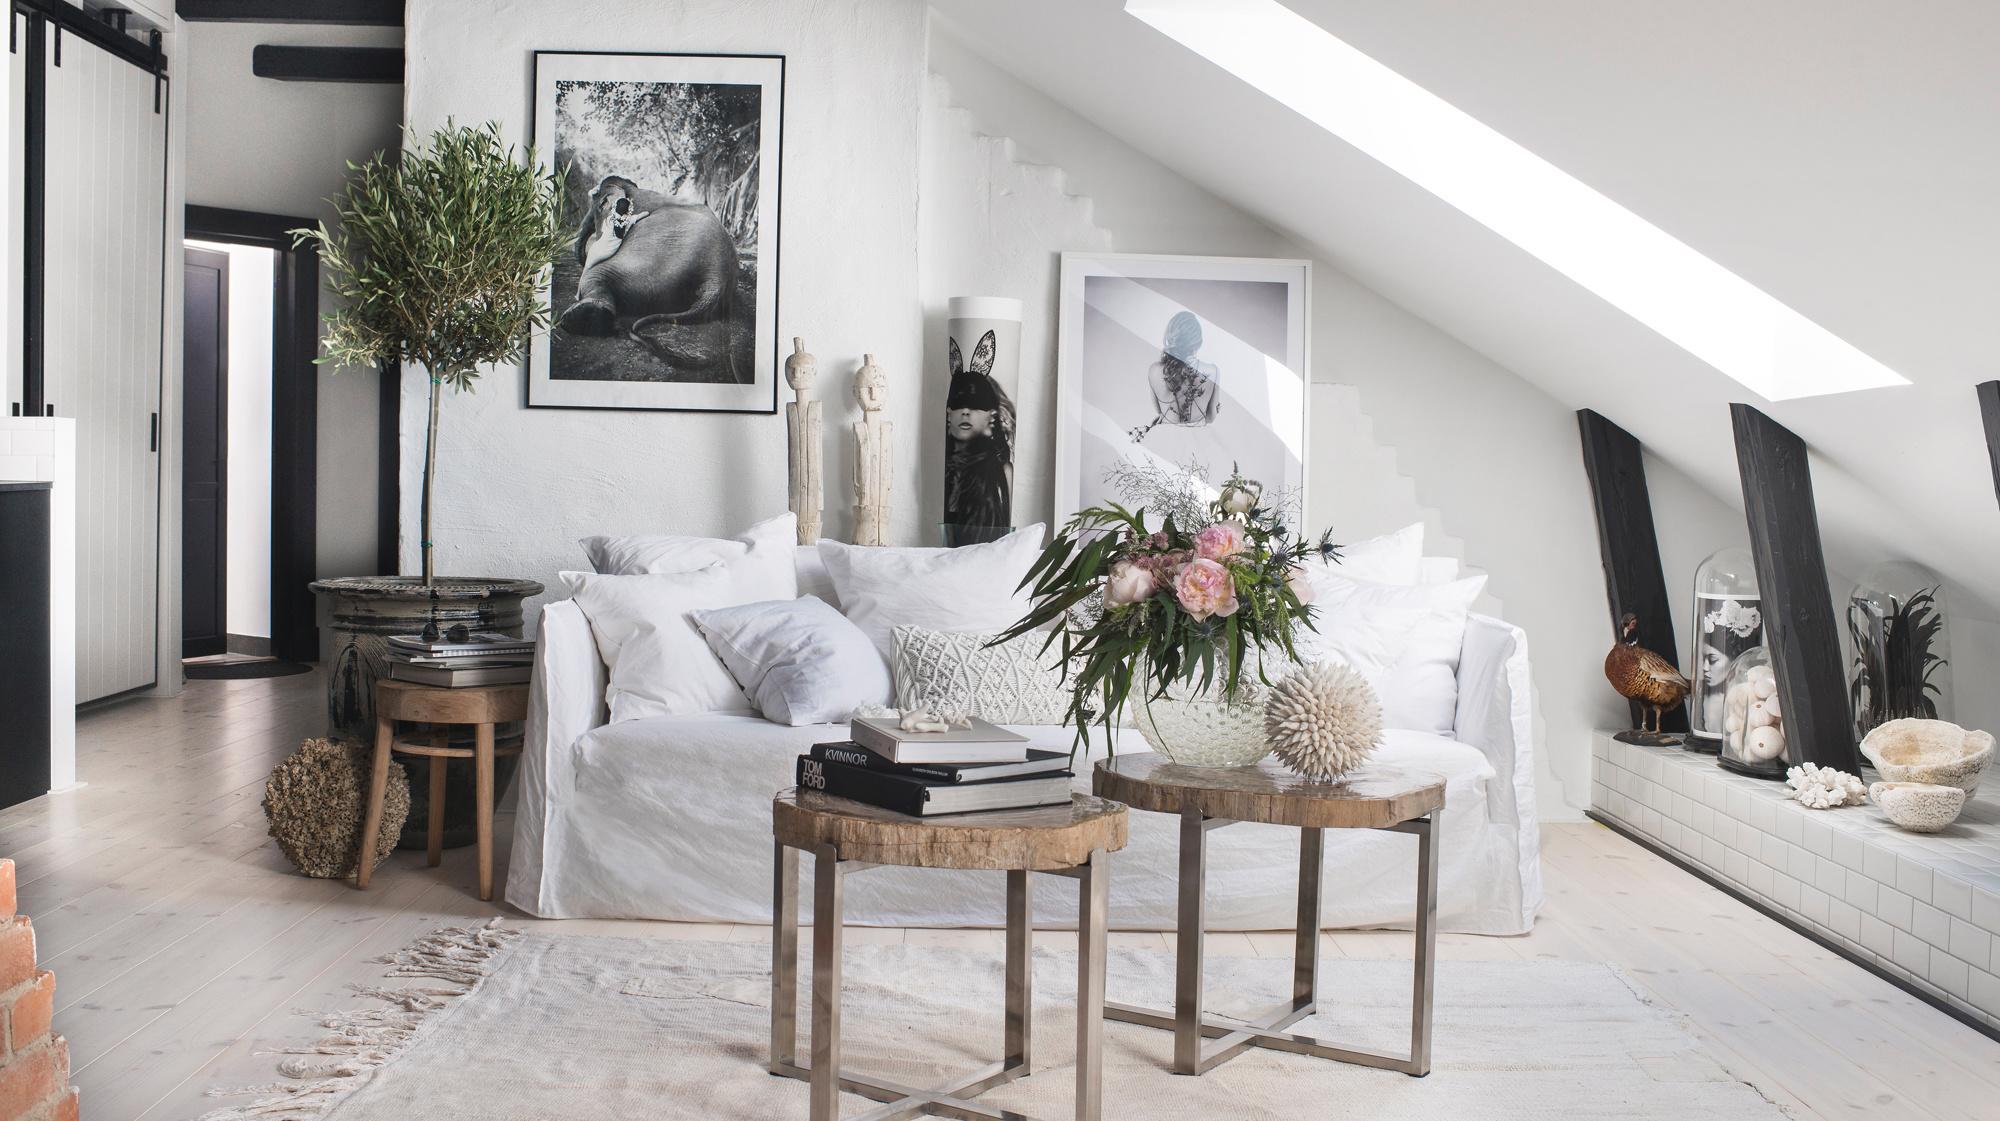 Vit lägenhet inredningsdesign